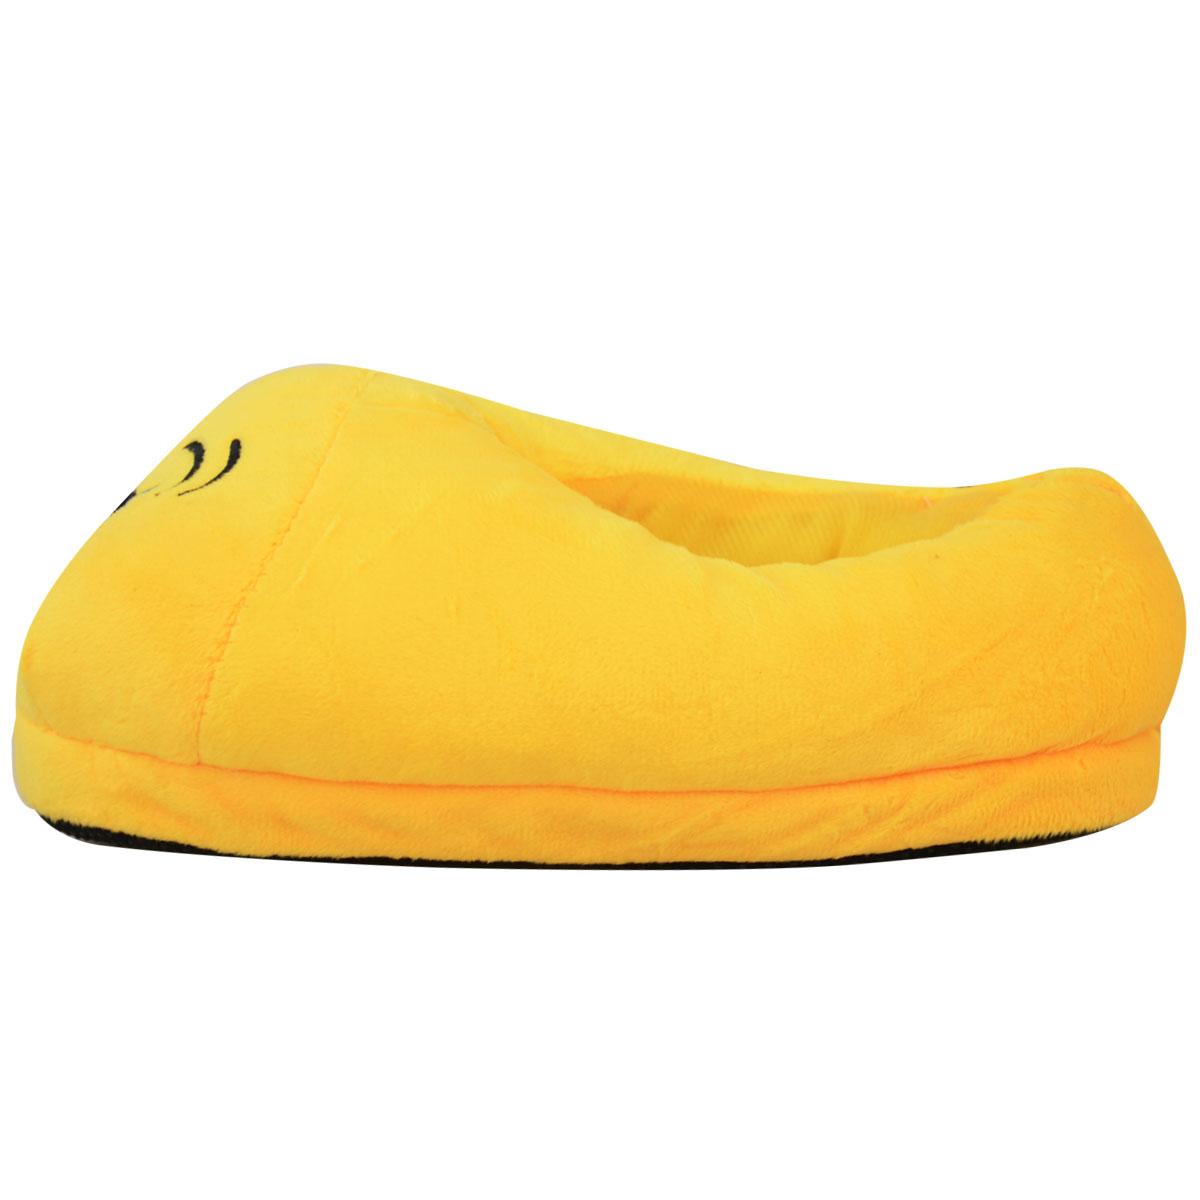 miniatura 10 - Uomini Donne Bambini Emoji Peluche imbottiti unisex Pantofola Inverno Casa Indoor Scarpe Taglia